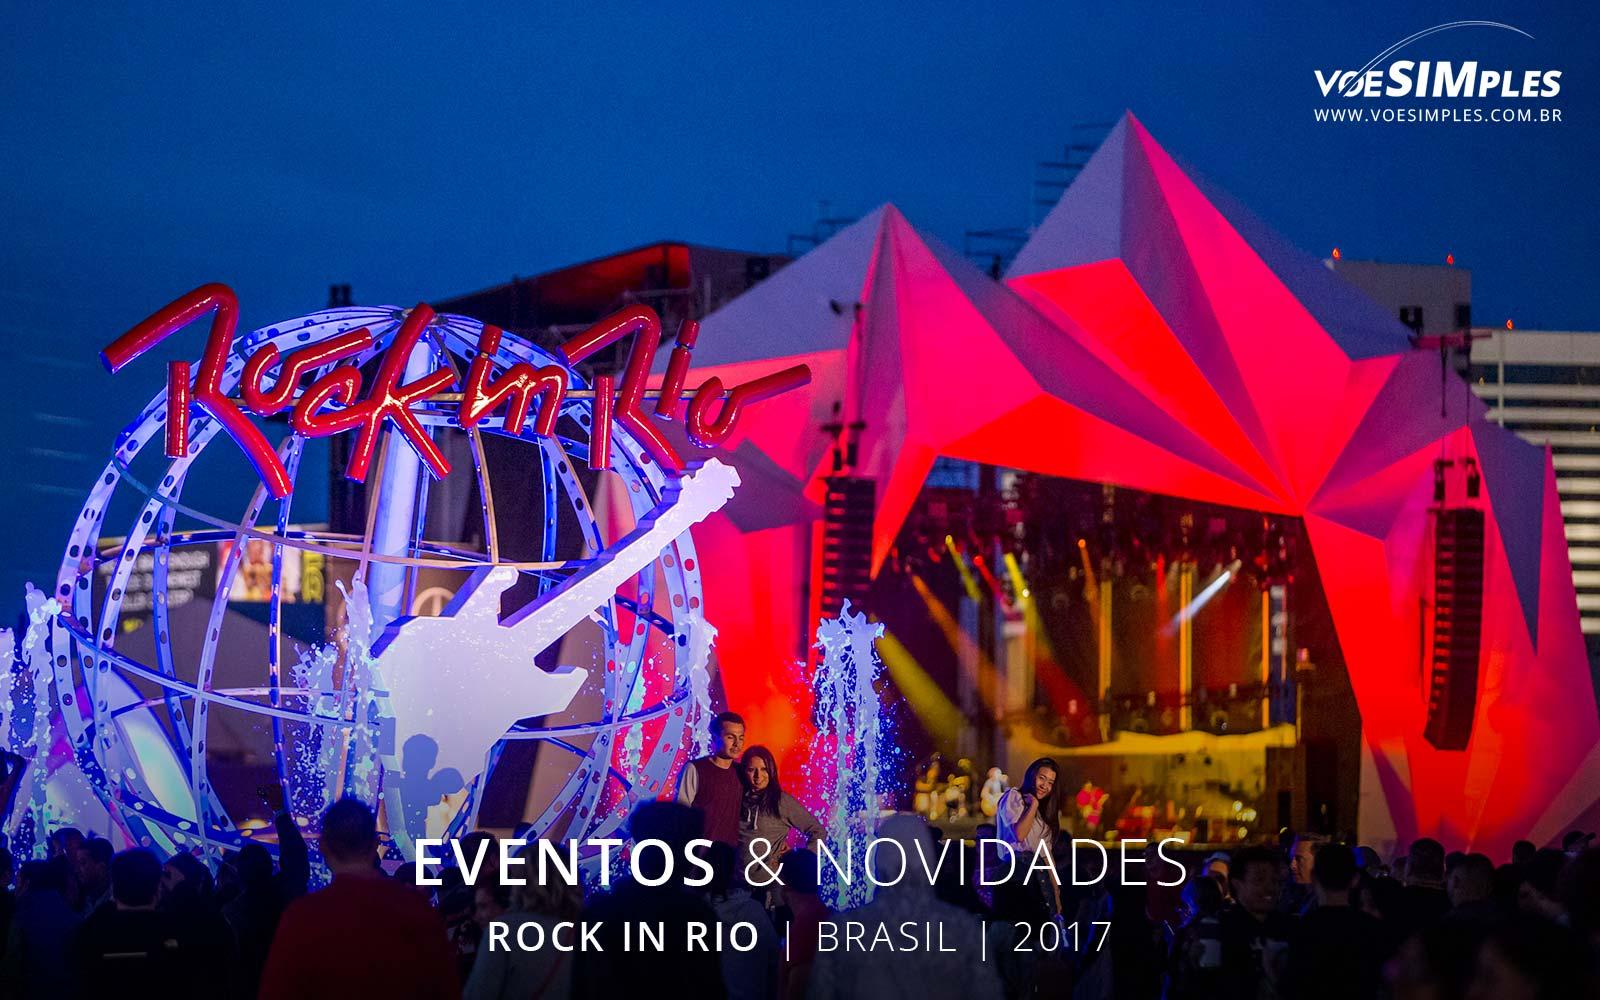 festival-rock-rio-brasil-2017-voesimples-passagens-aereas-promocionais-rock-rio-passagens-promo-rock-rio-2017